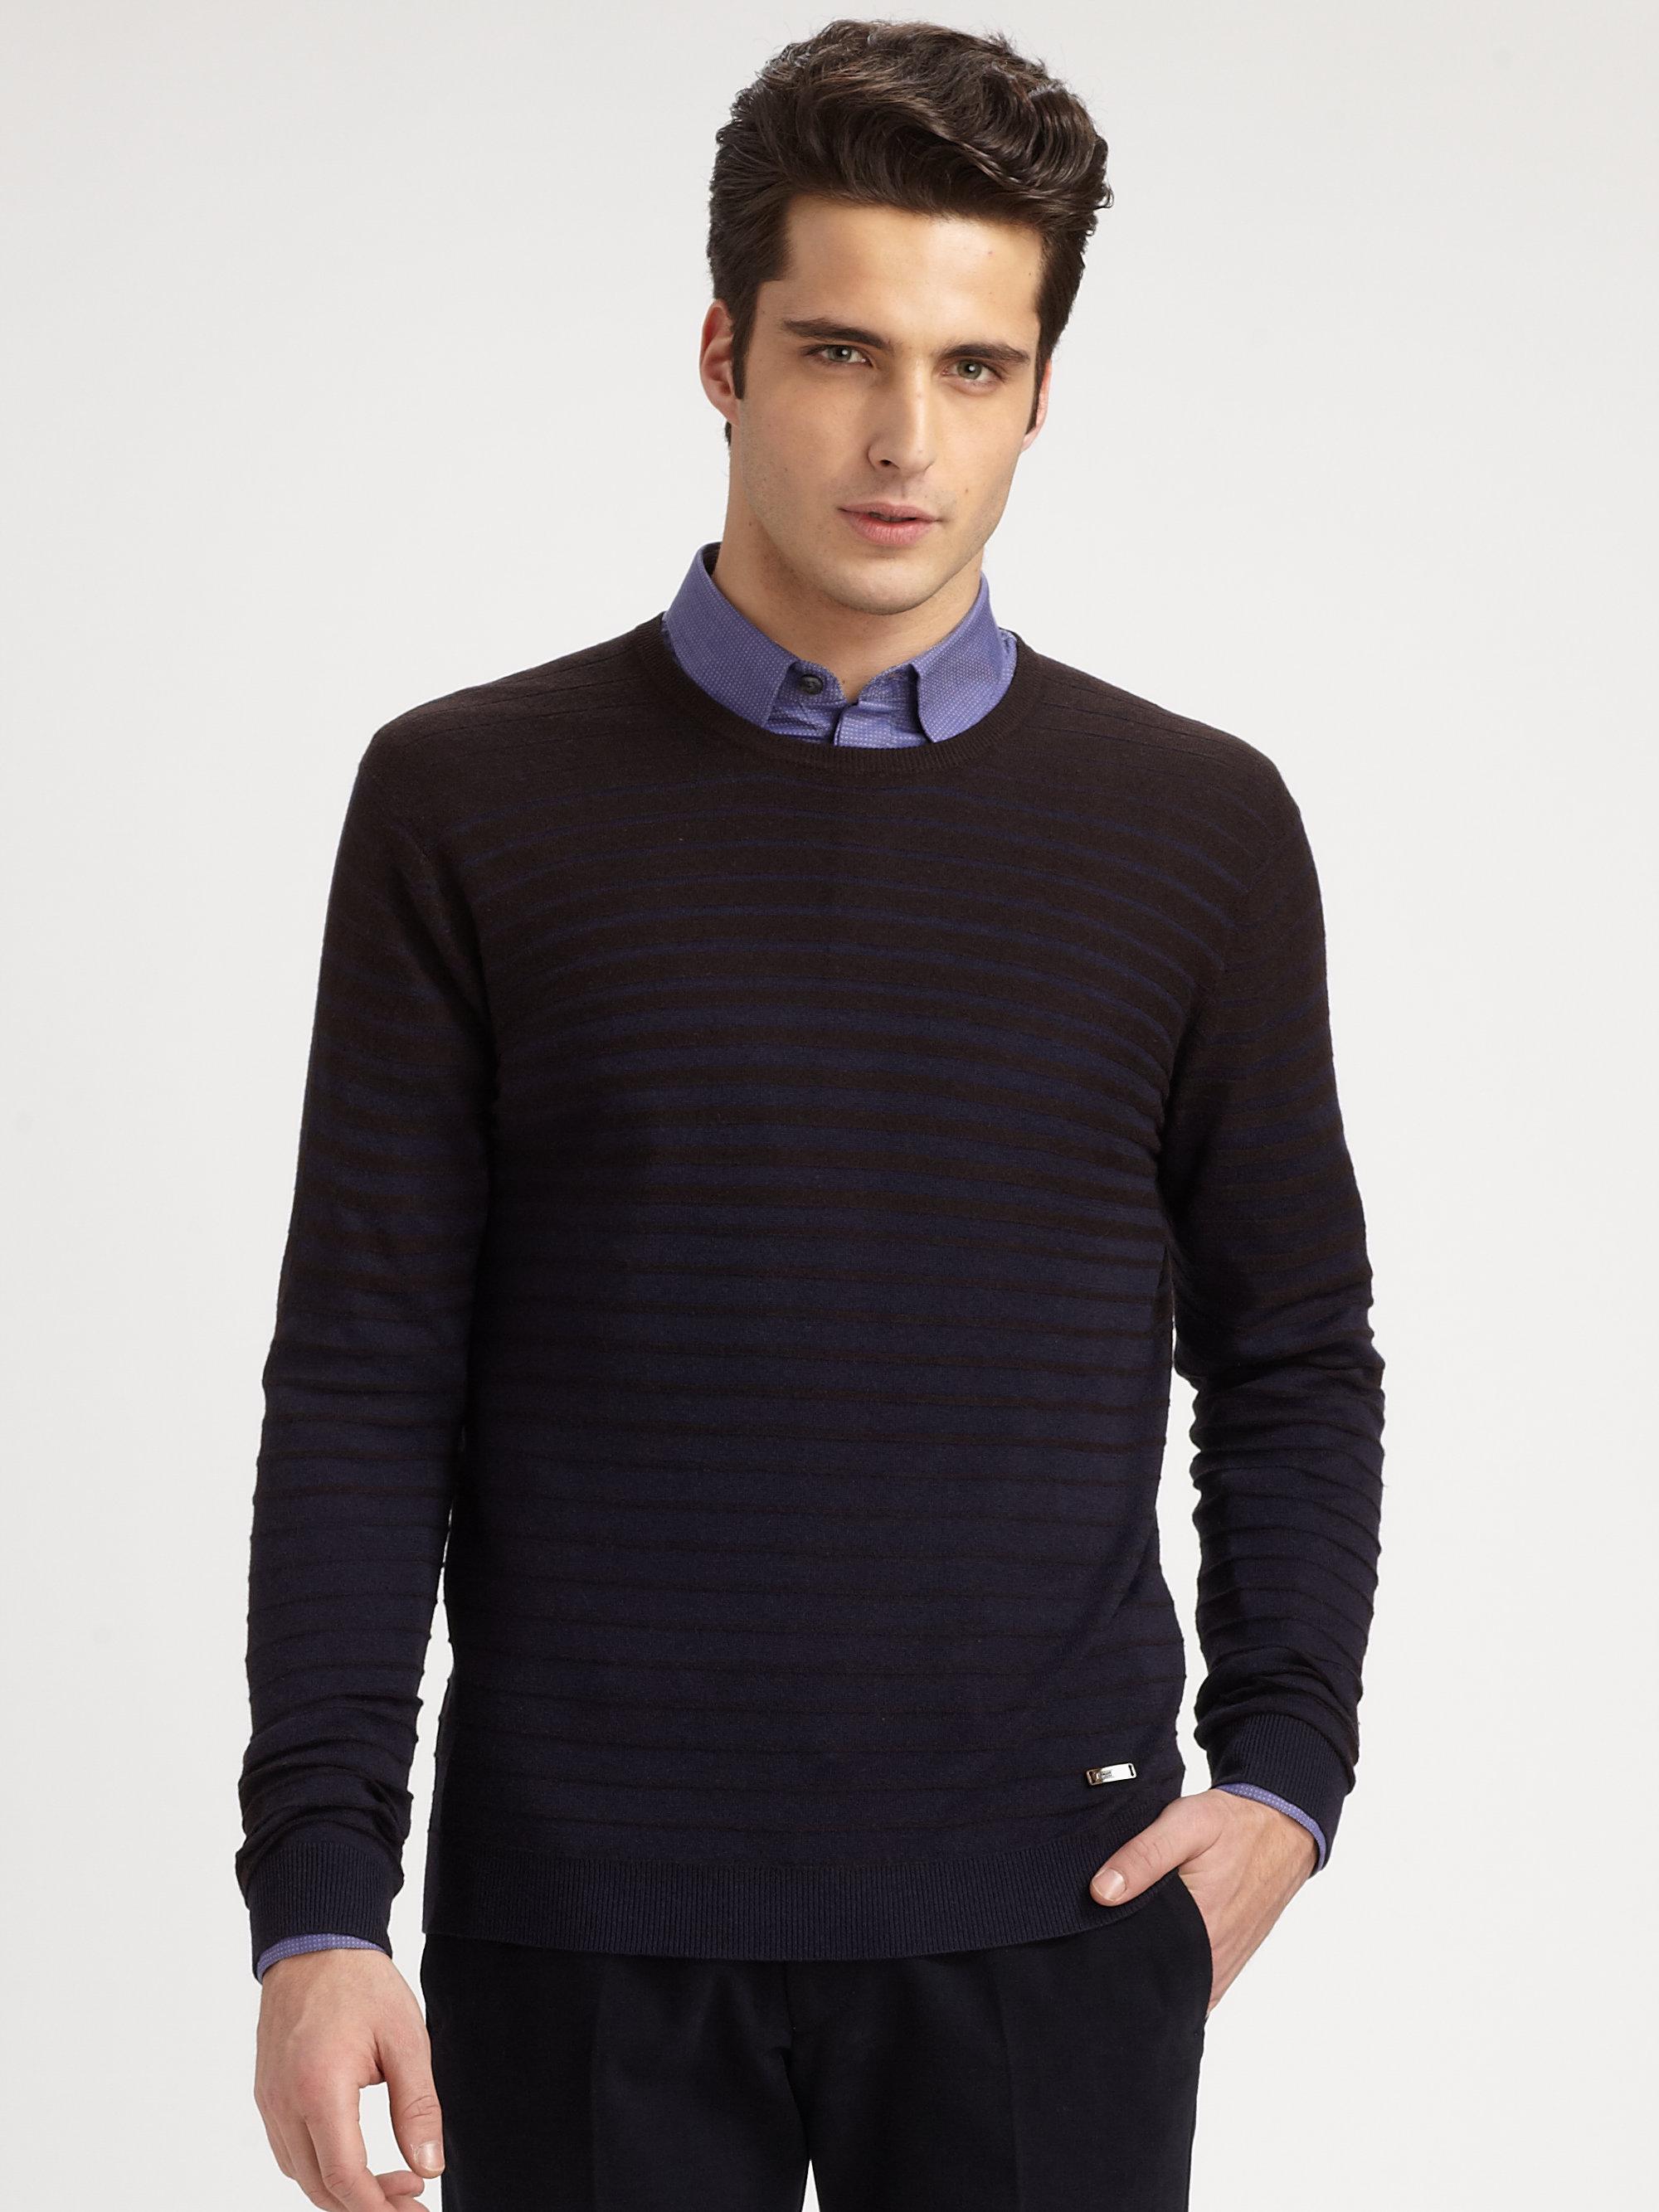 Armani Silk Camel Hair Texturedstripe Sweater in Brown for Men | Lyst